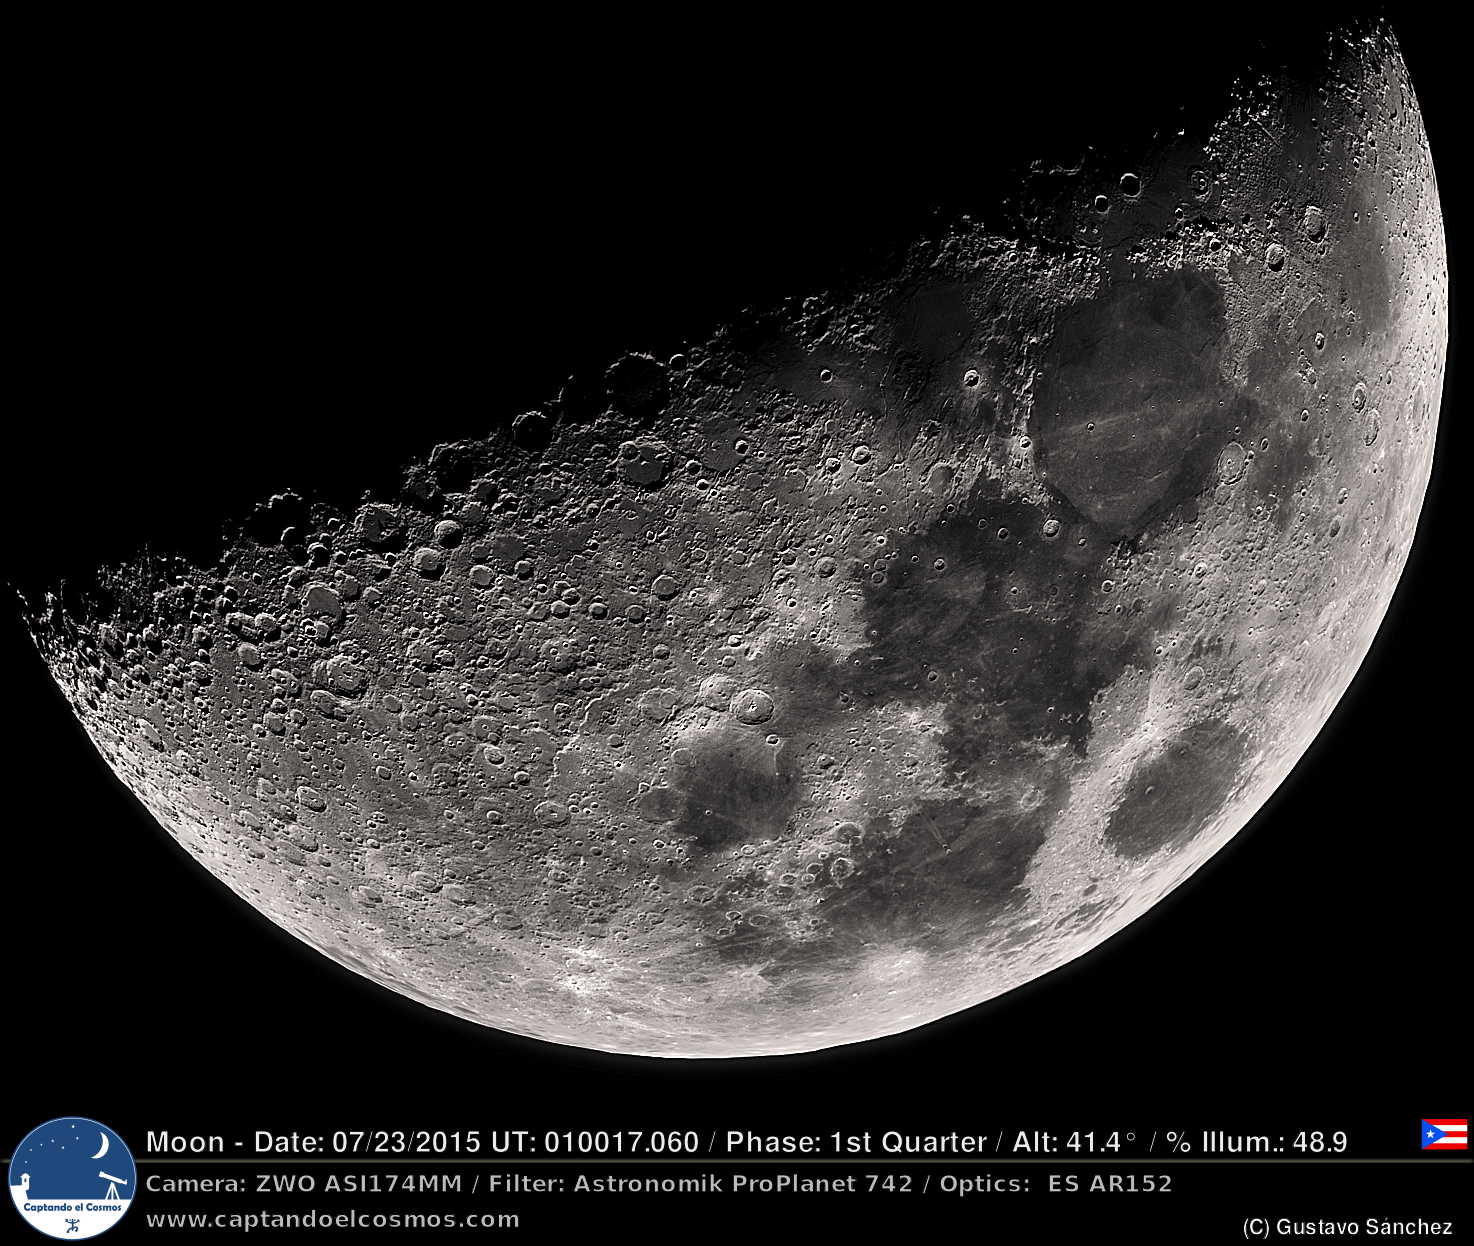 Moon_210000_g3_b3_ap1255-reg.png